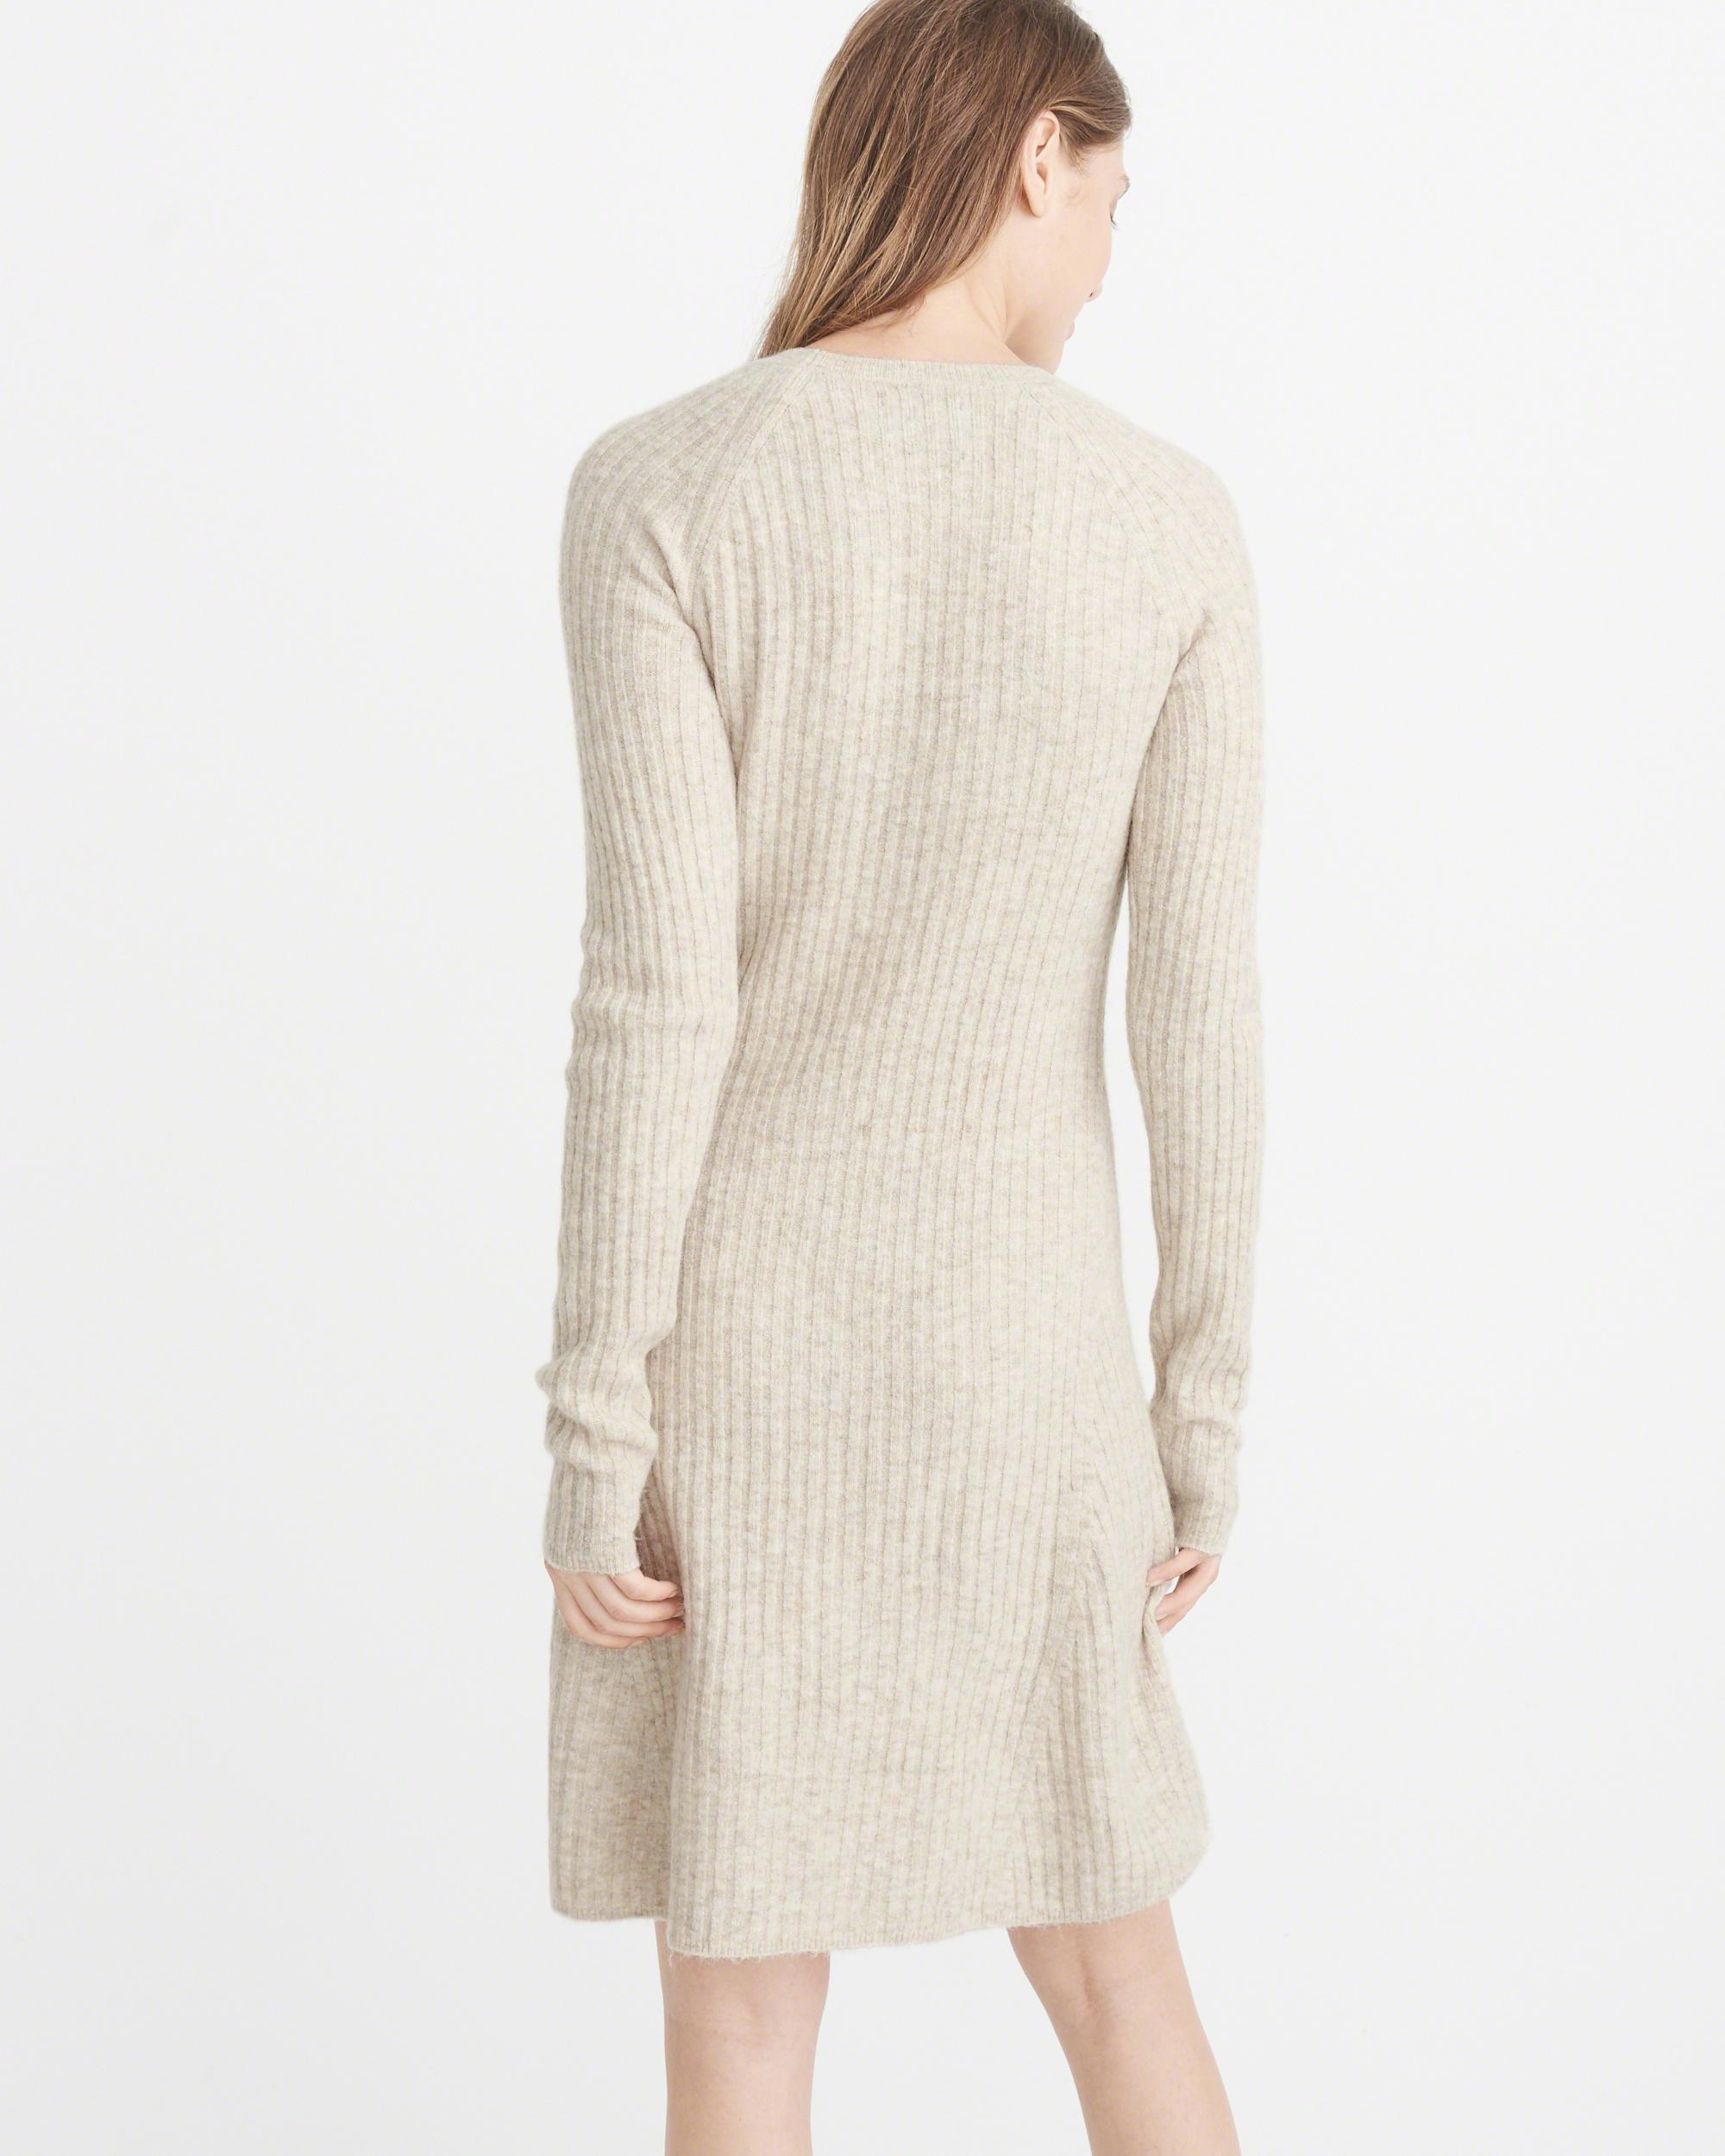 Cream color sweater dress